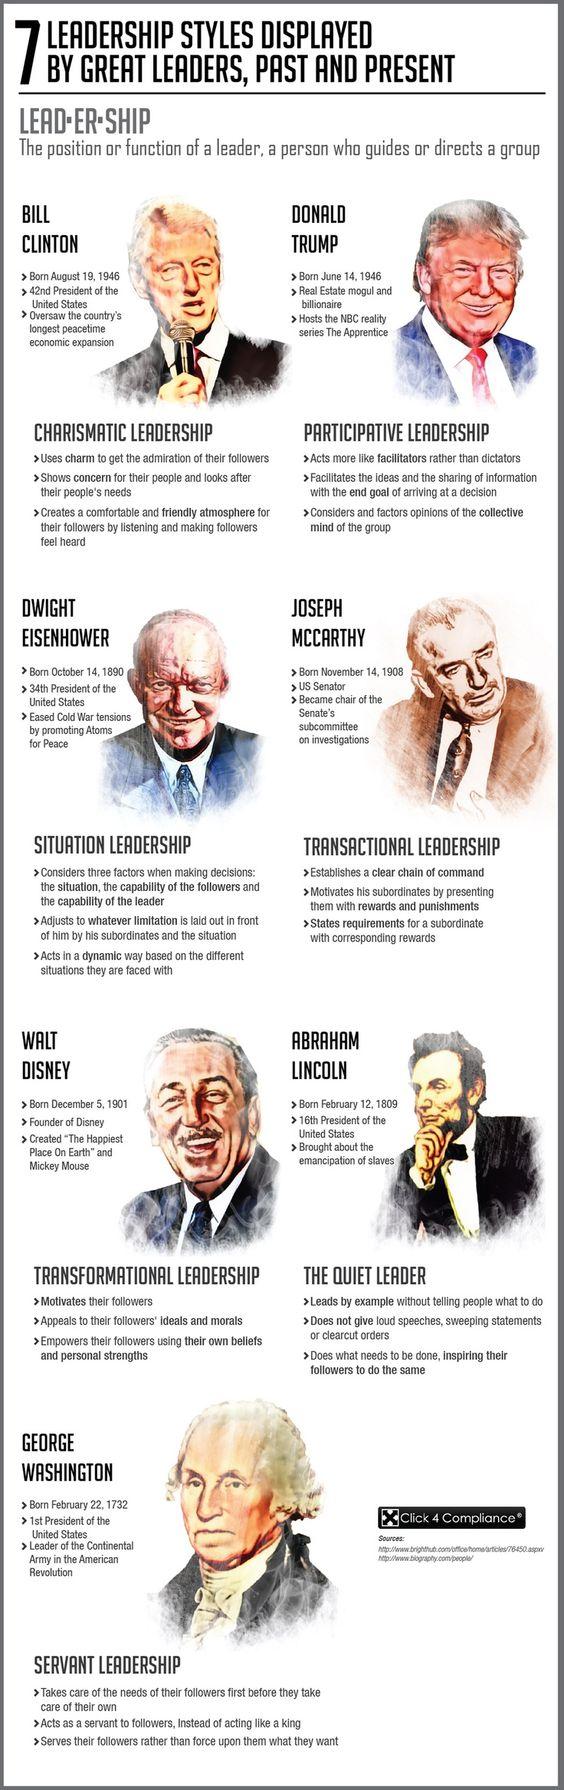 leadership-styles-donald-trump-clinton